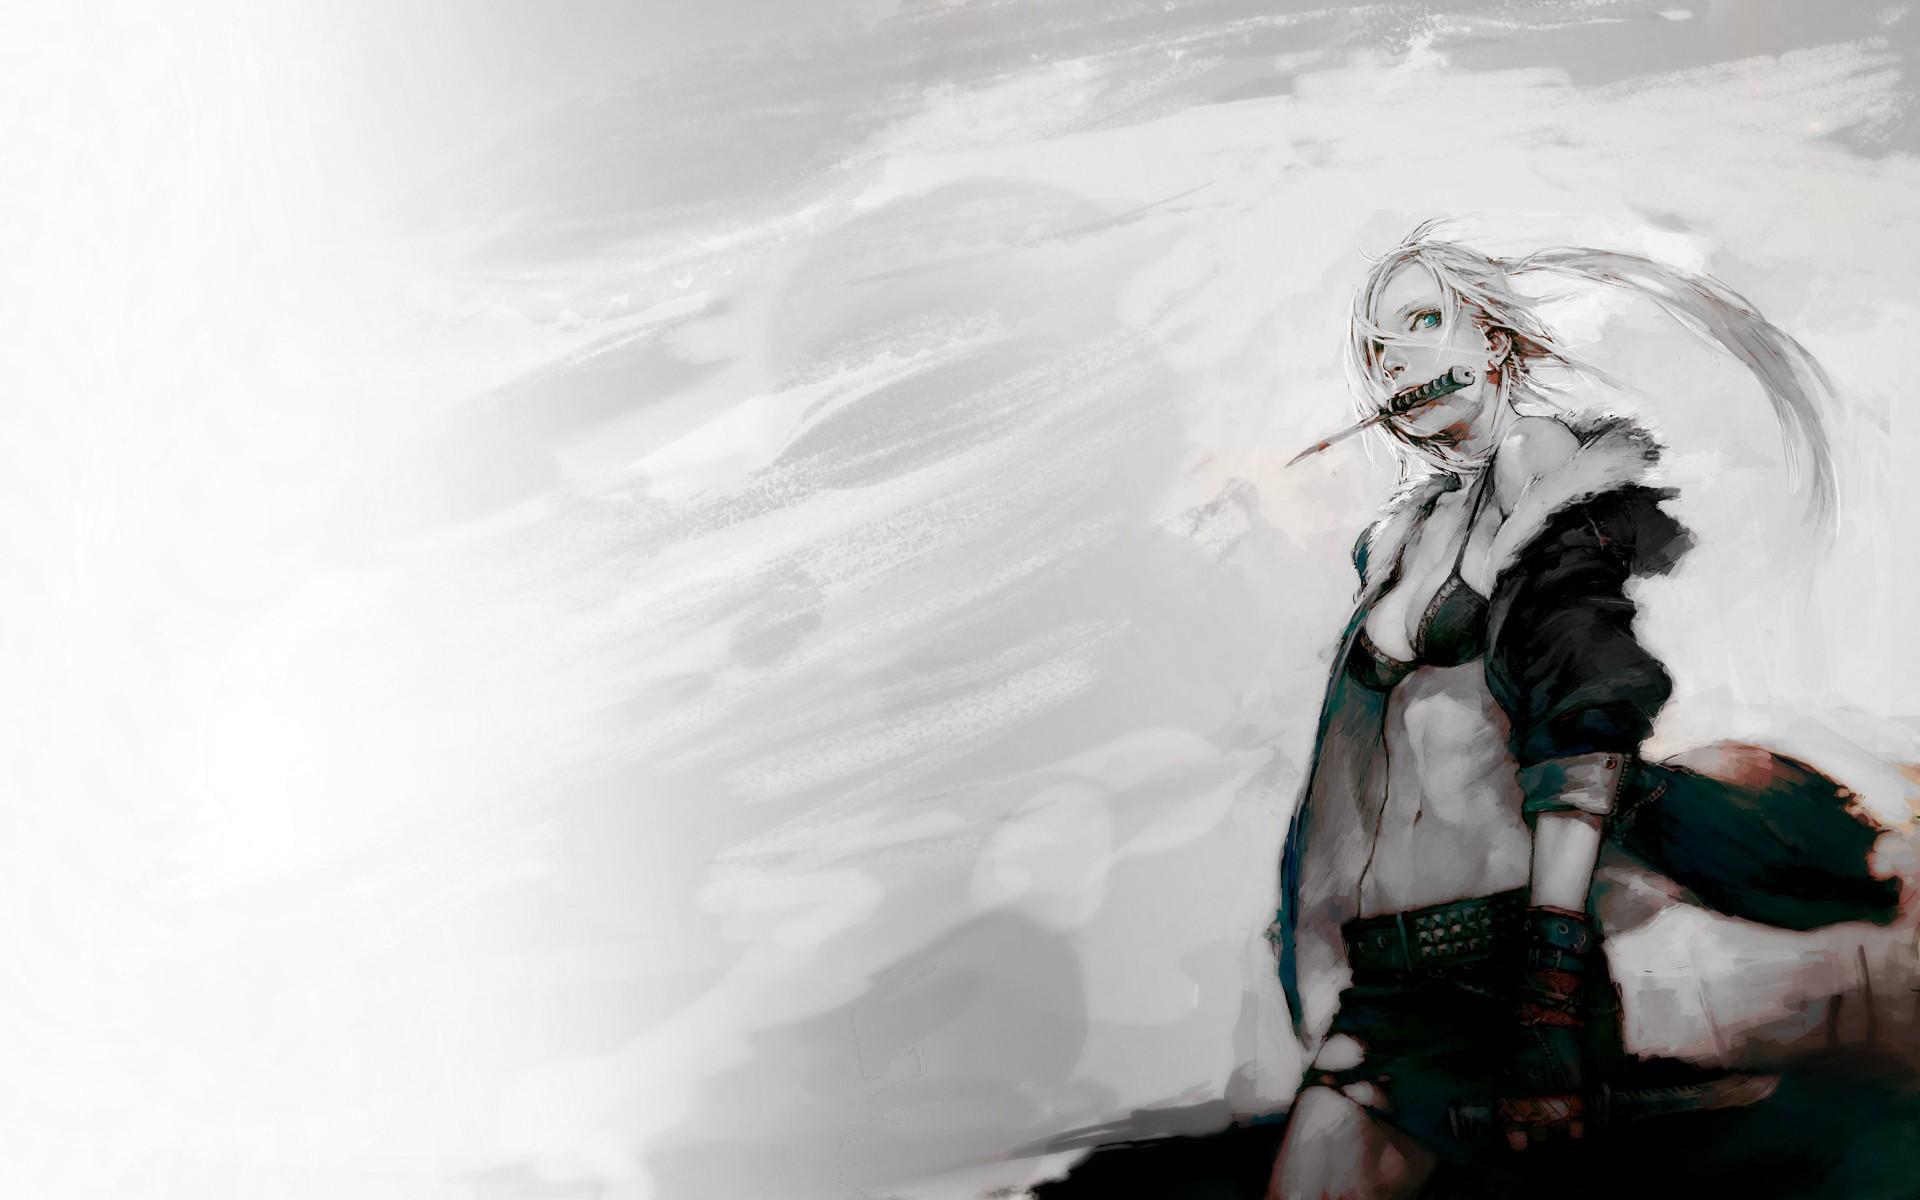 Tapety Vykres Bily Bile Vlasy Anime Divky Modre Oci Zima